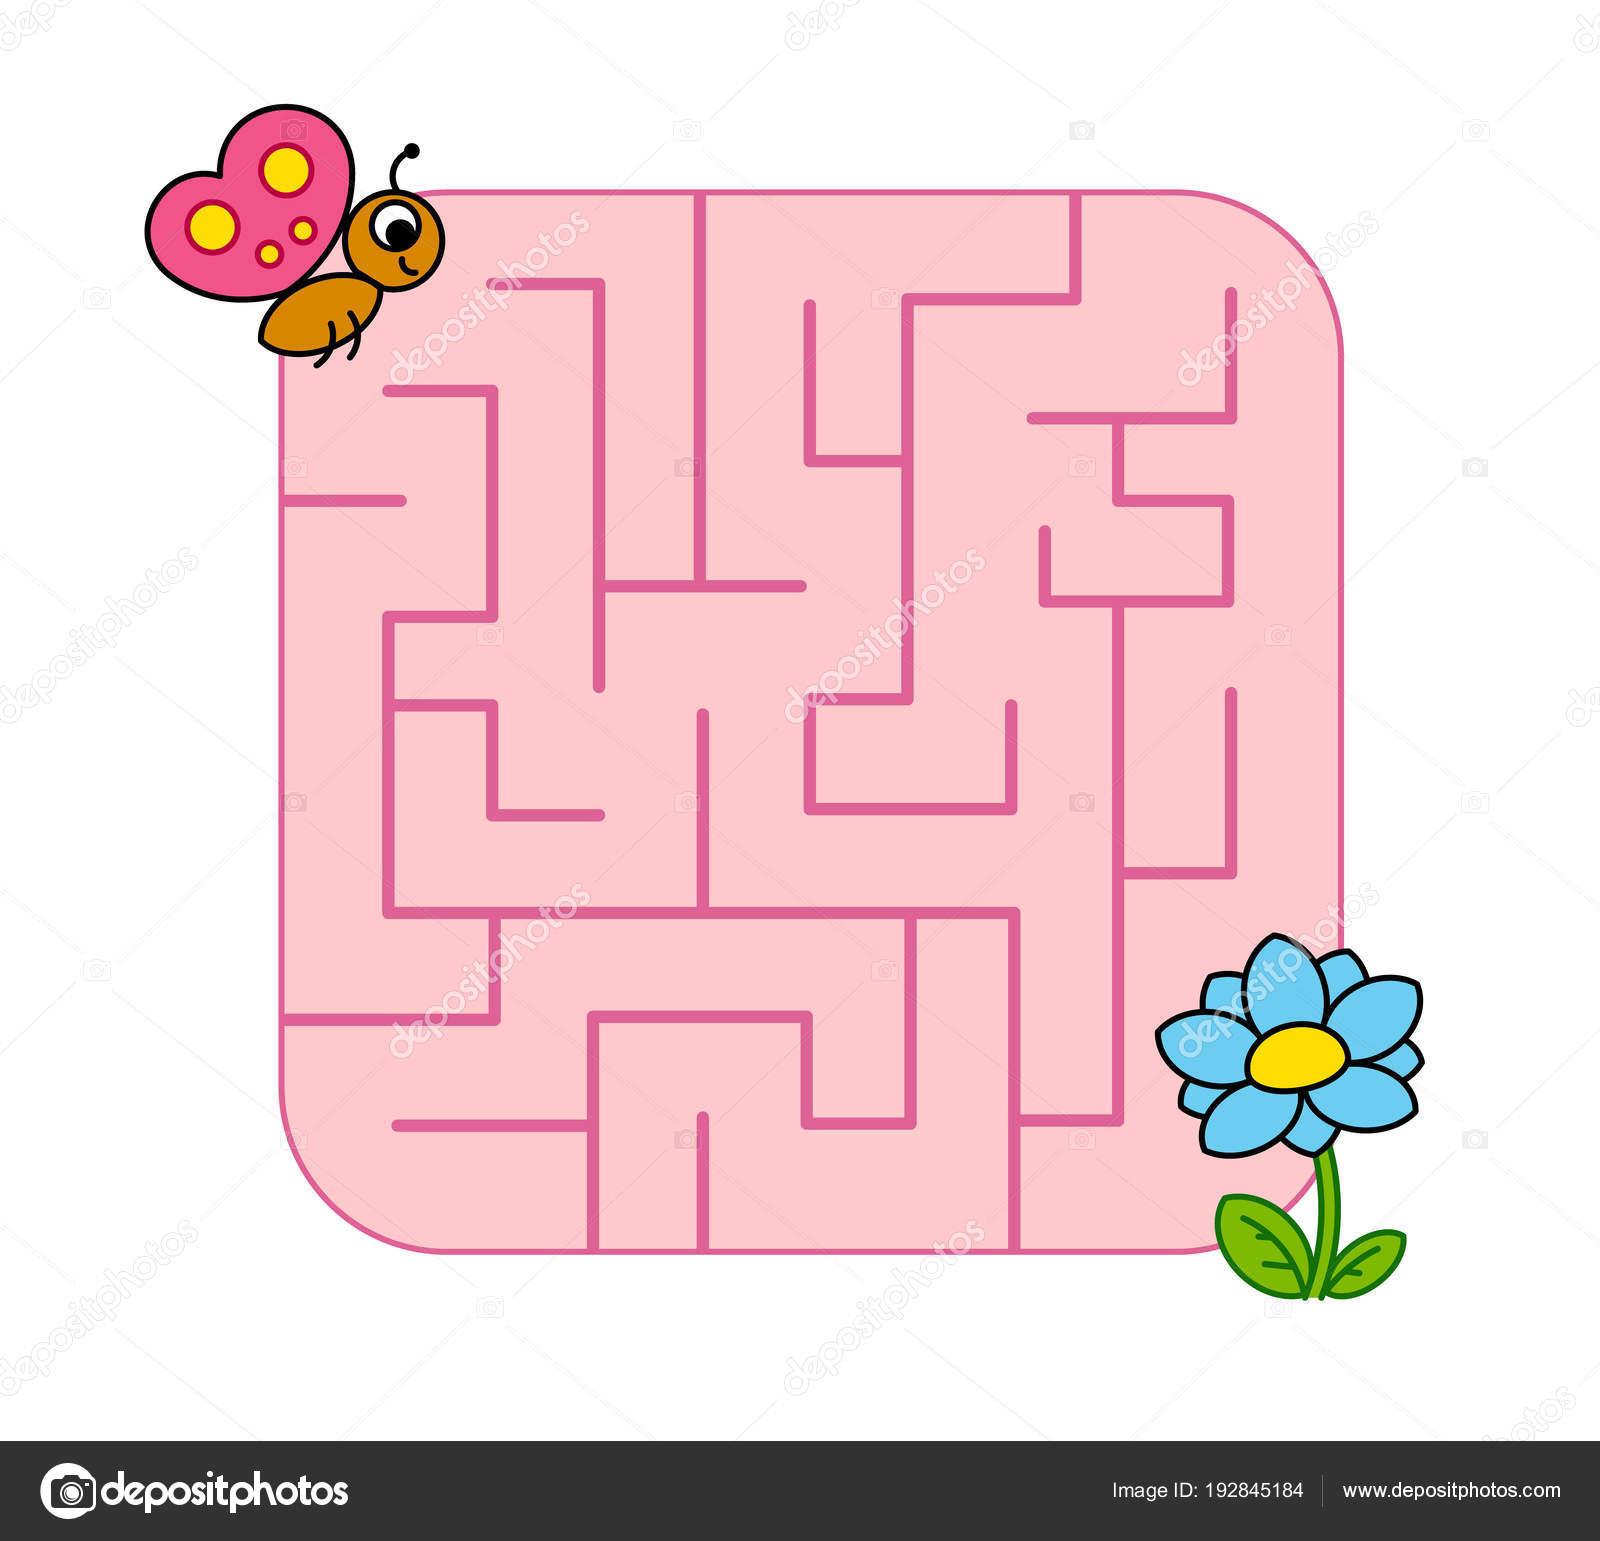 Help Baby Butterfly Cub Find Path Flower Labyrinth Maze